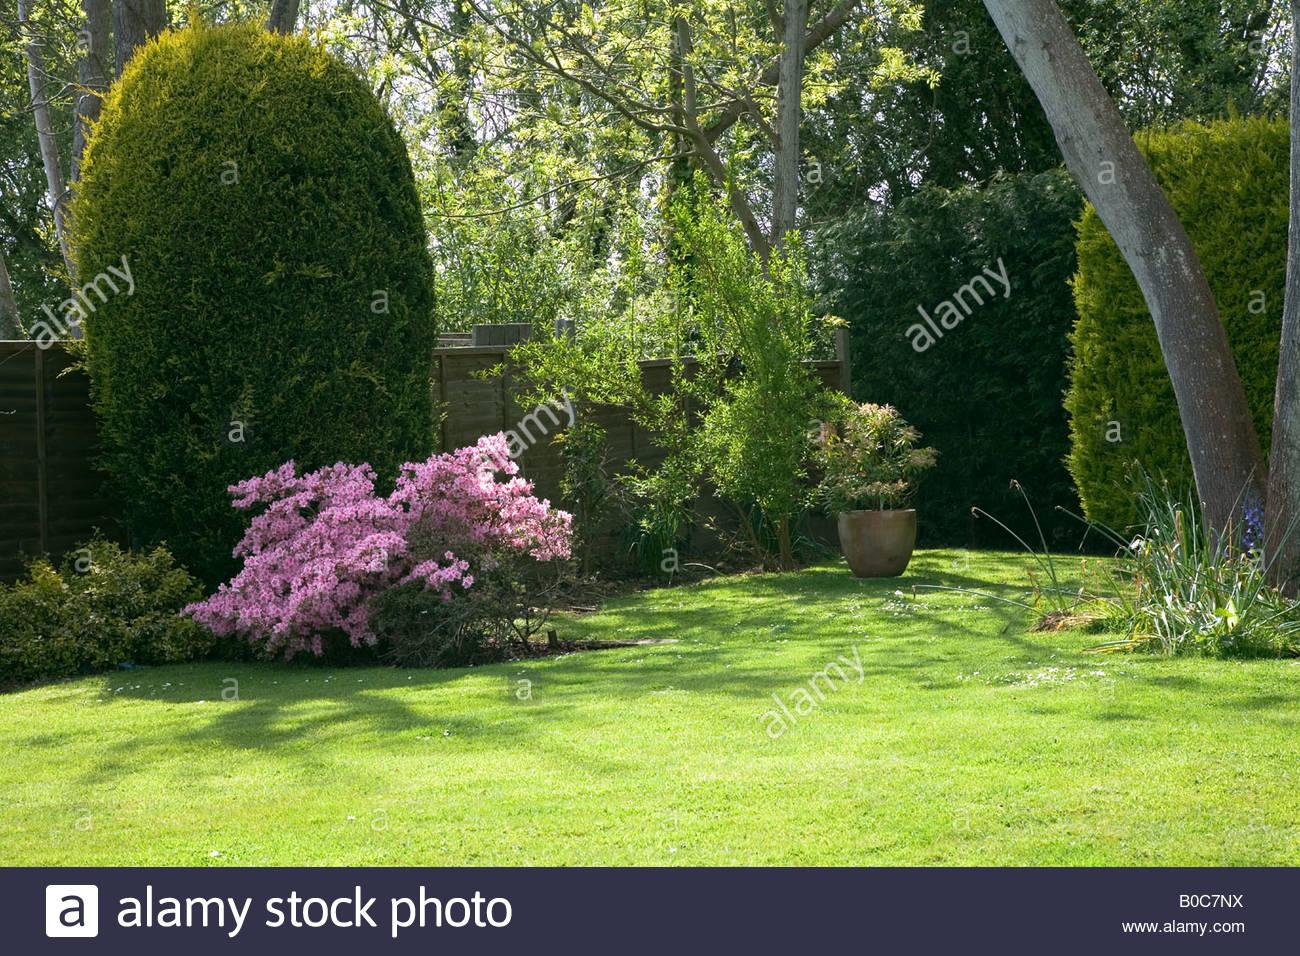 garden showing pink azalea bush and conifers - Stock Image